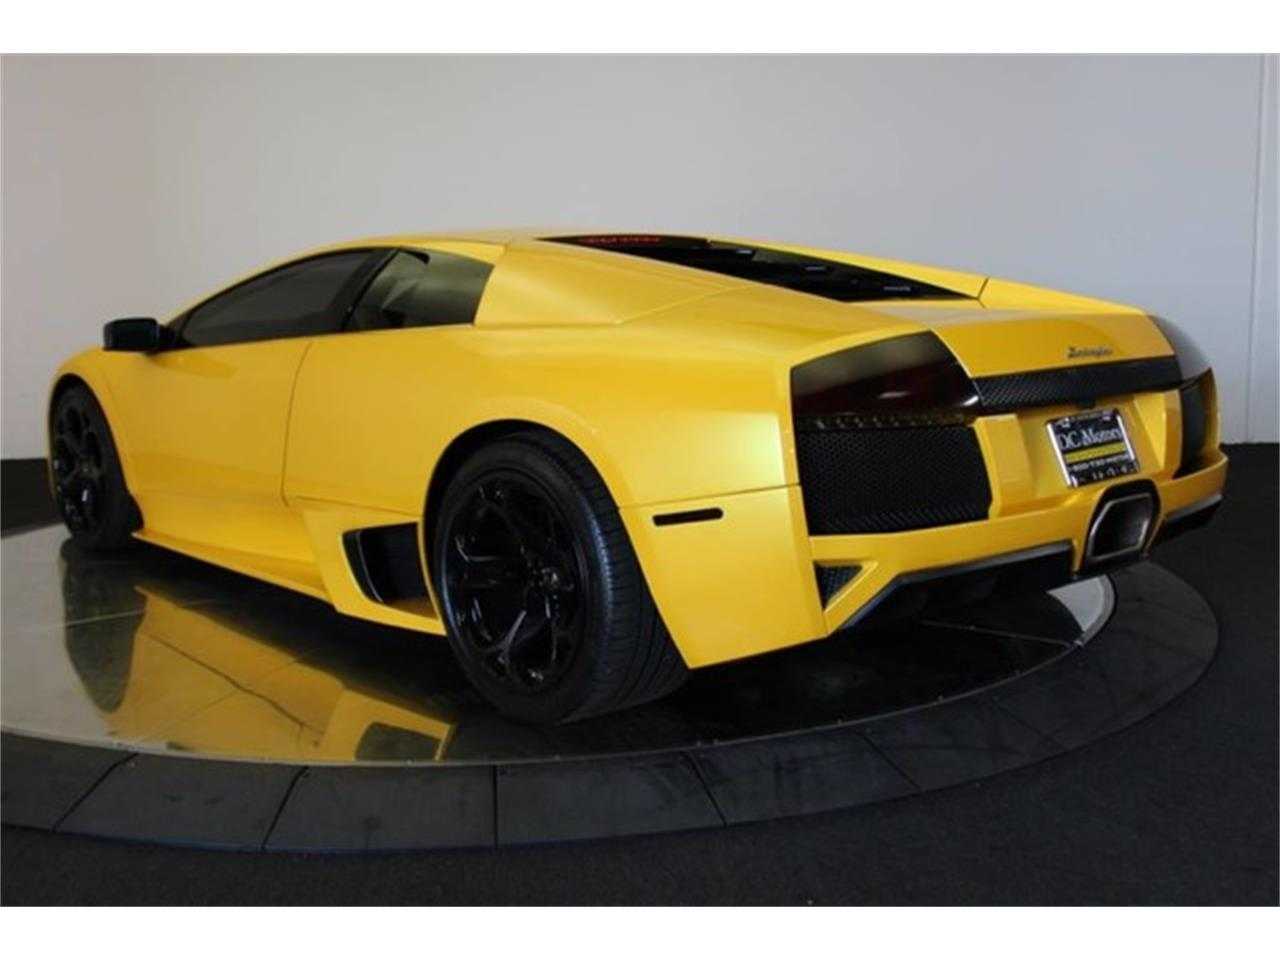 Large Picture of '07 Lamborghini Murcielago - $165,900.00 Offered by DC Motors - L7IL